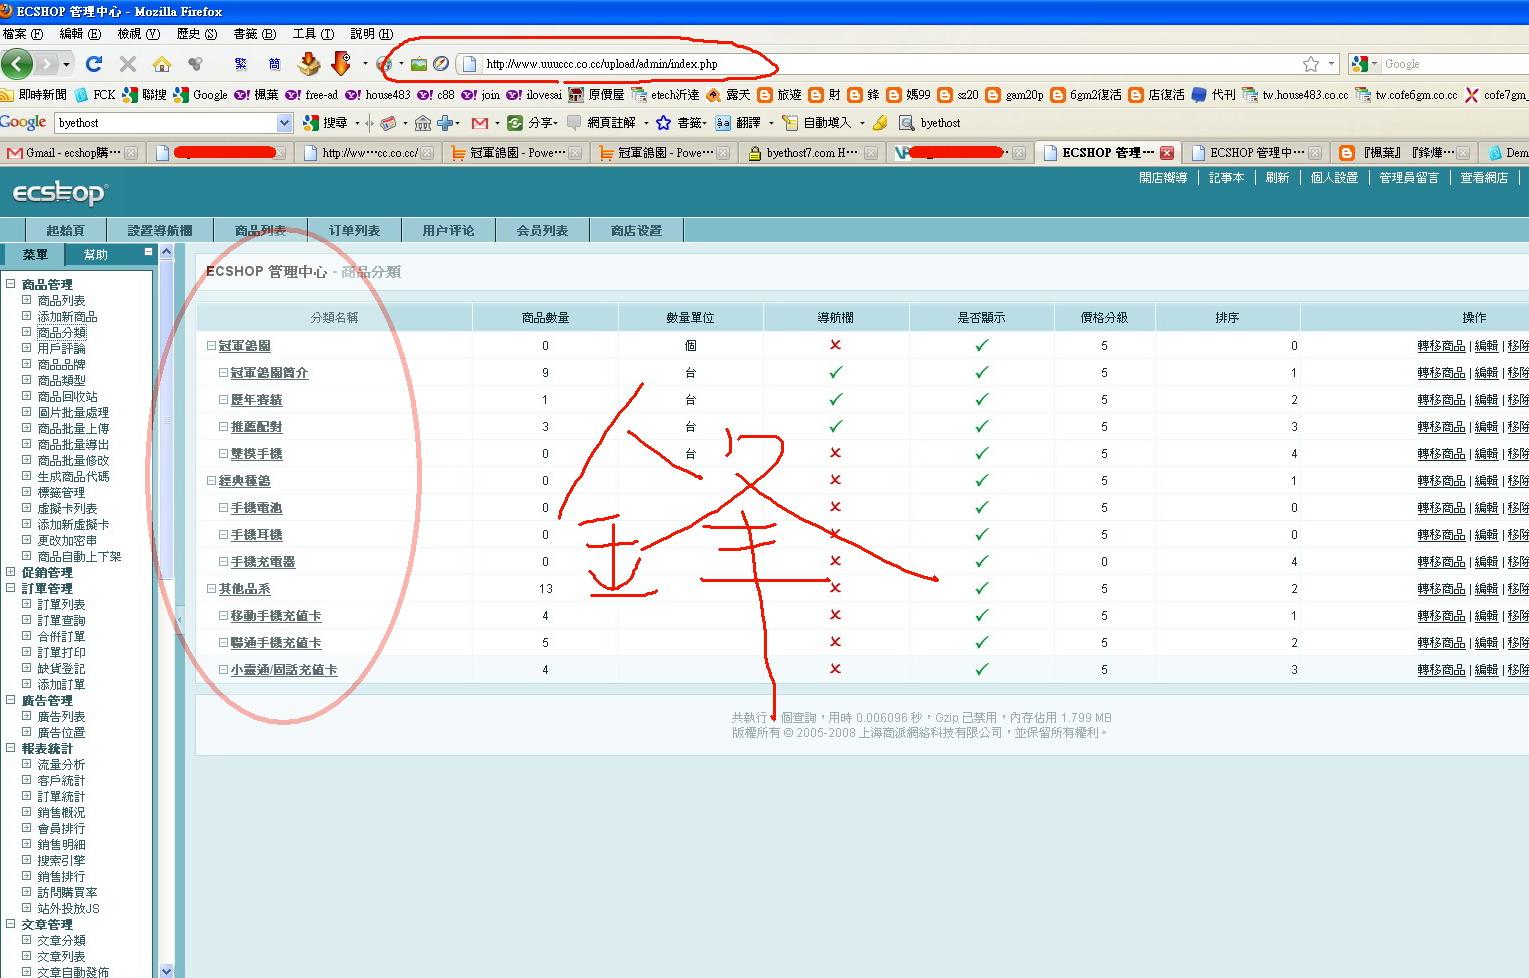 http://3.bp.blogspot.com/_YahEQlQy0Zg/TBX_sps1wMI/AAAAAAAAPXY/B-N9ge1cL-s/s1600/web22ok.jpg